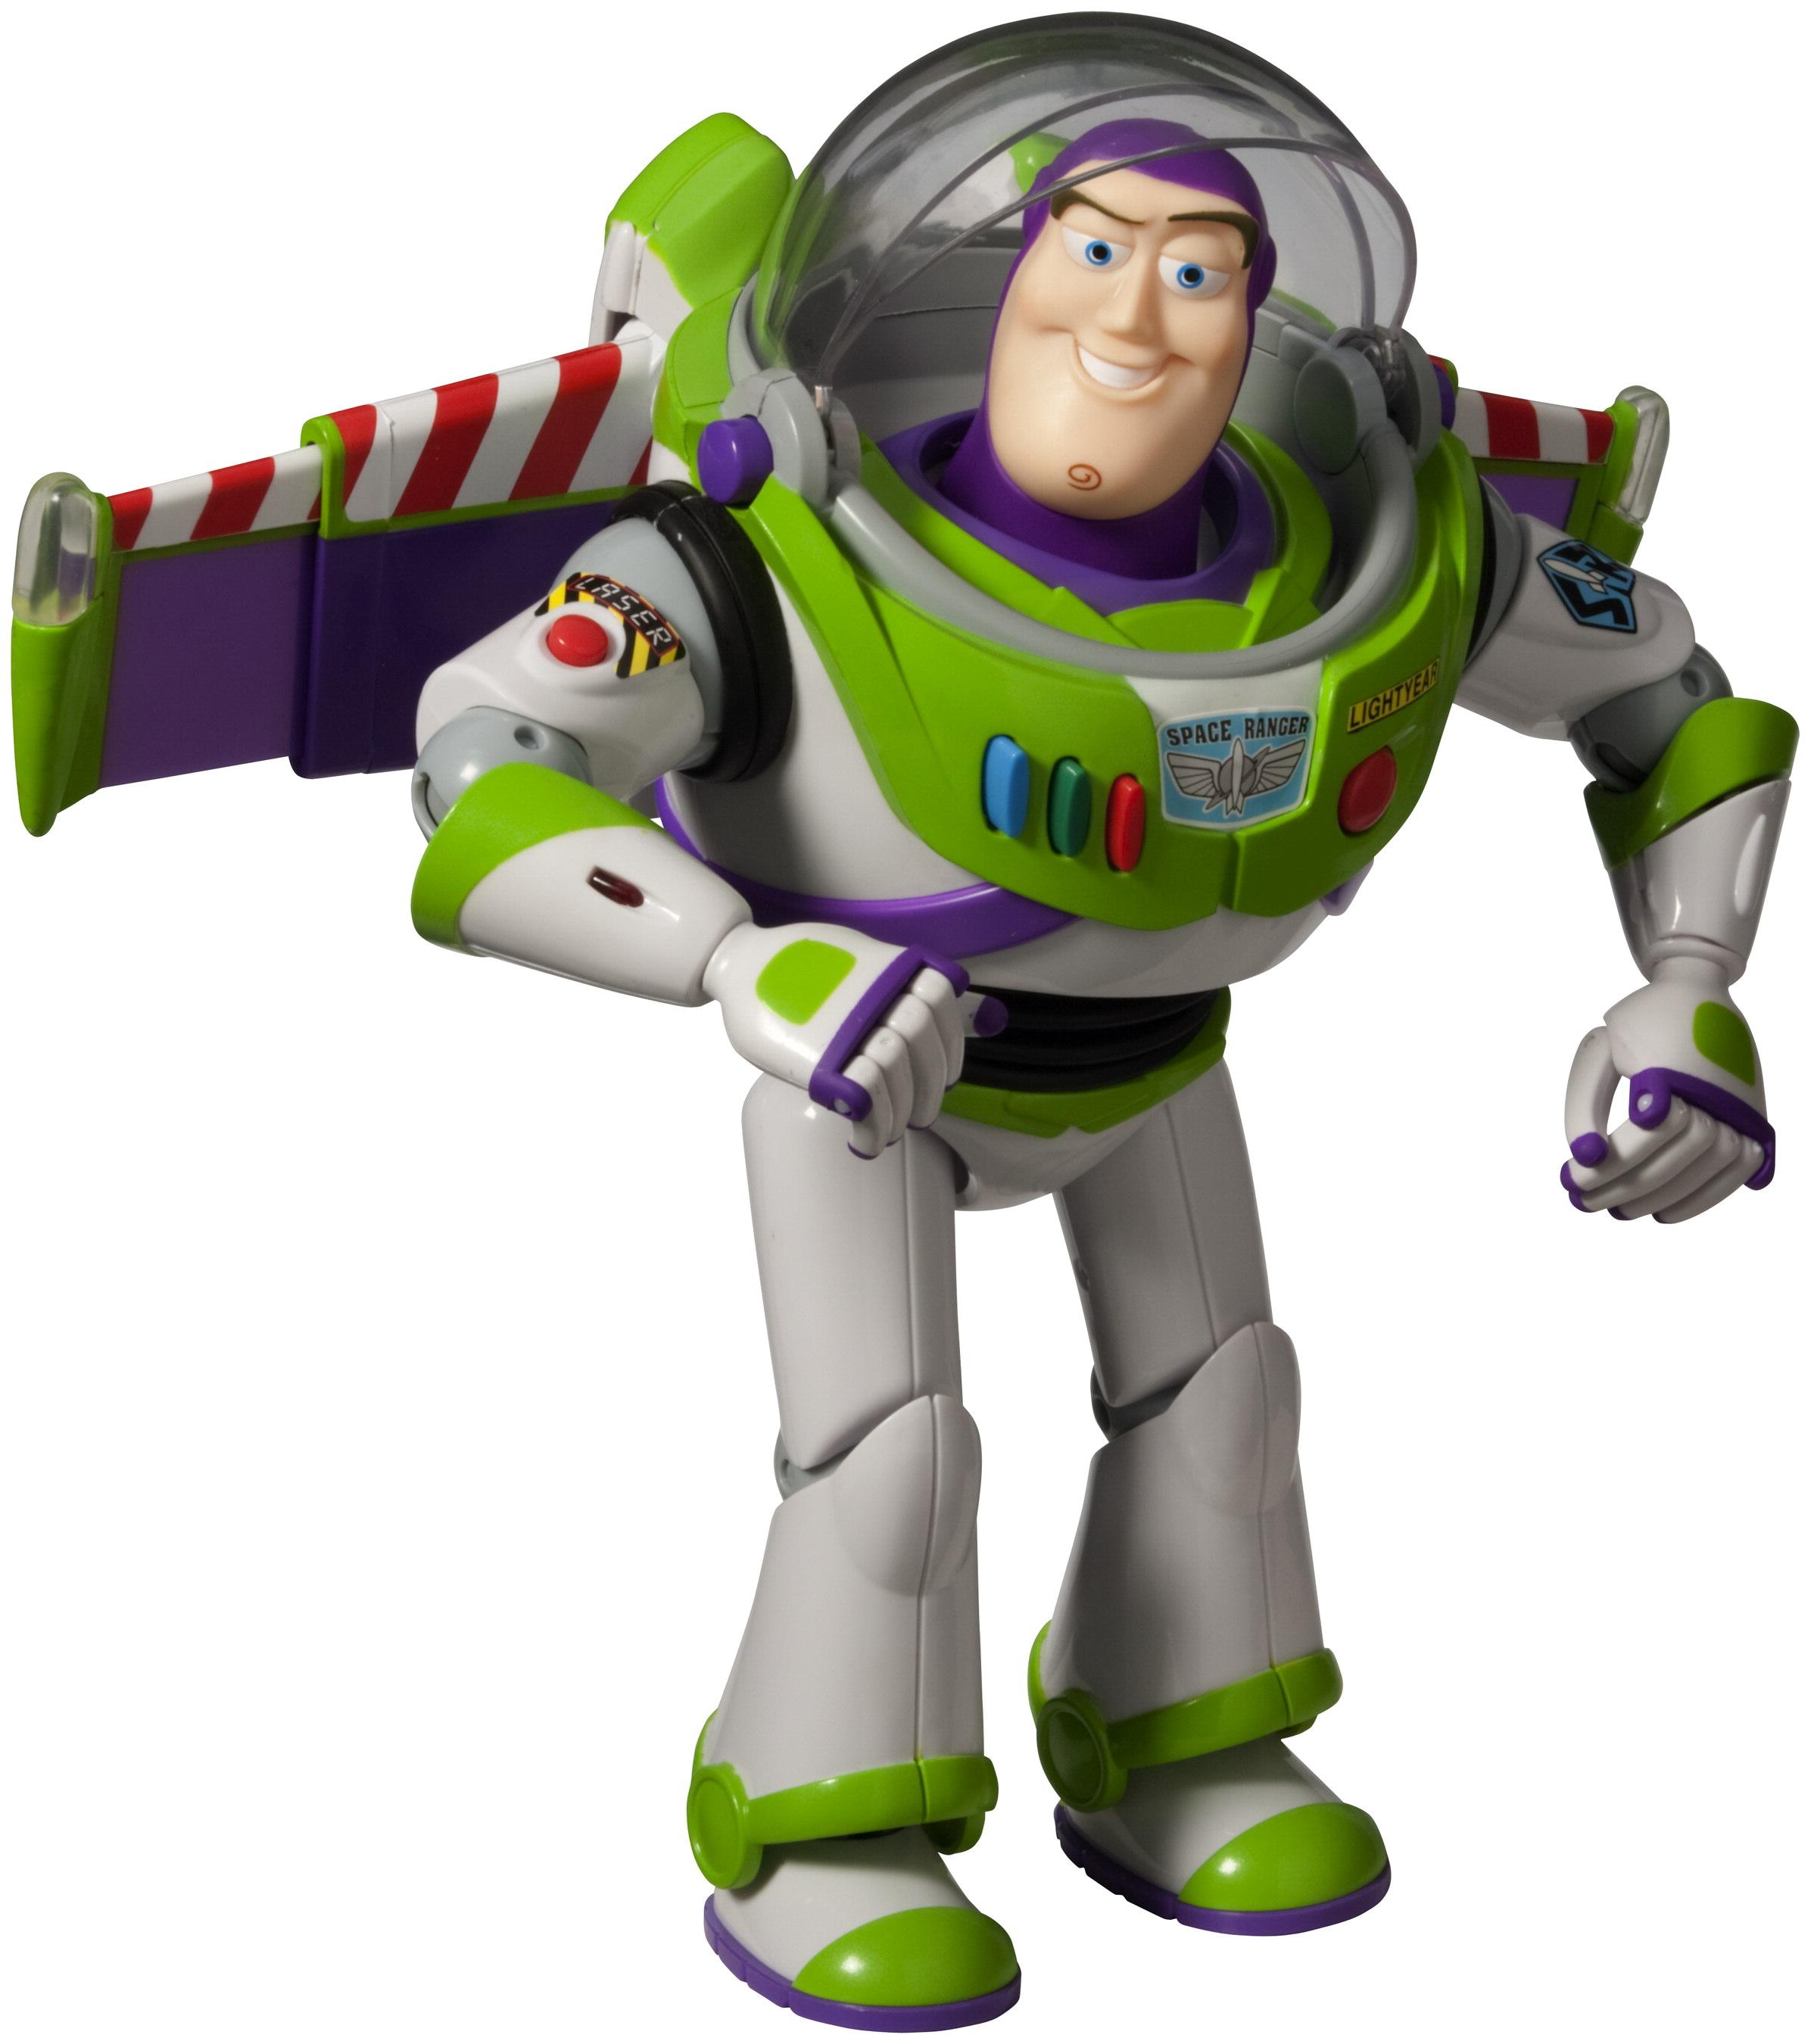 Buzz Lightyear Toys Picture Buzz Lightyear Toys Image Buzz